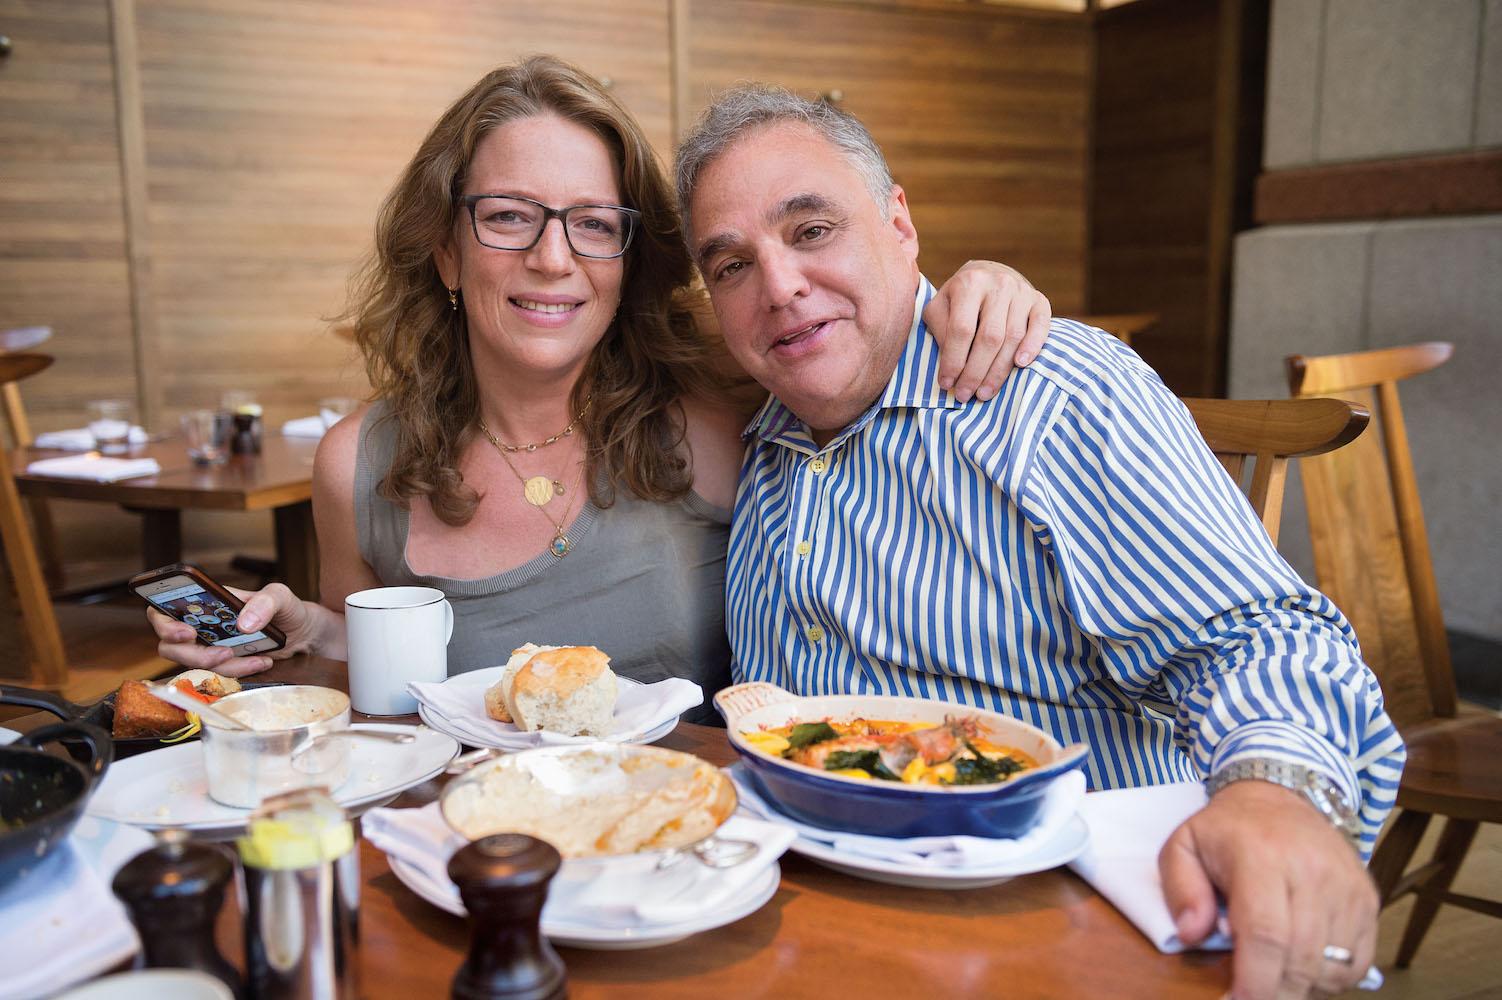 America's Breakfast Authors Adeena Sussman and Lee Schrager